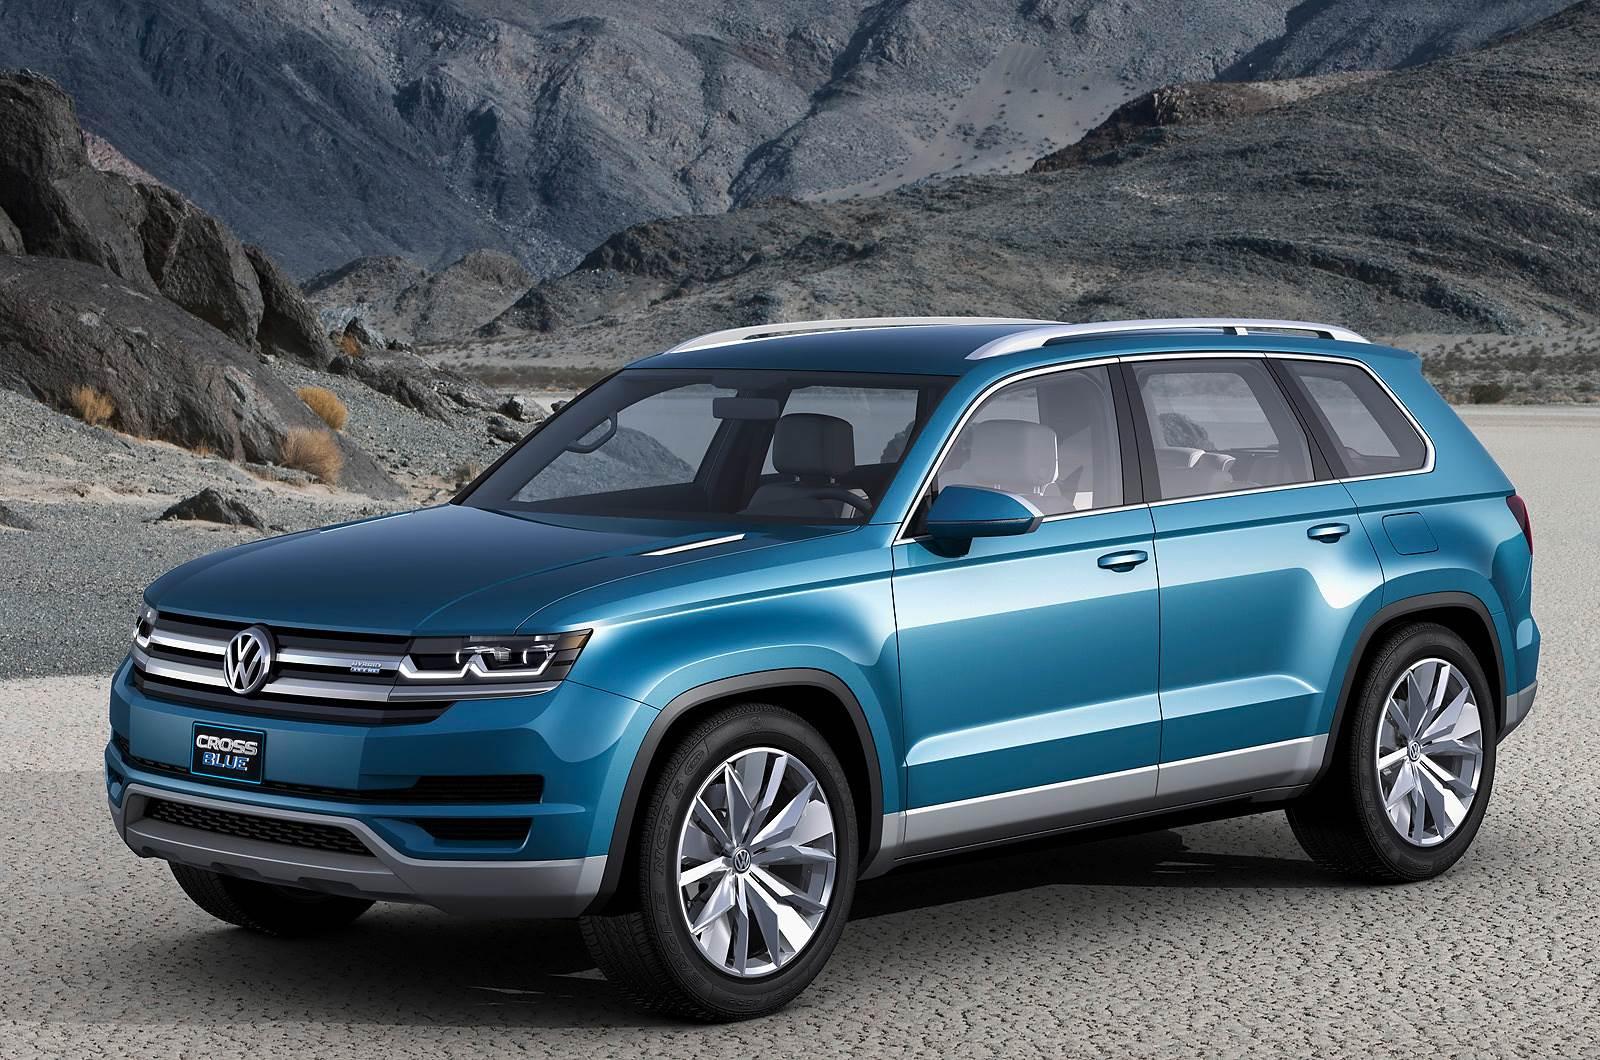 Volkswagen unveils CrossBlue SUV concept